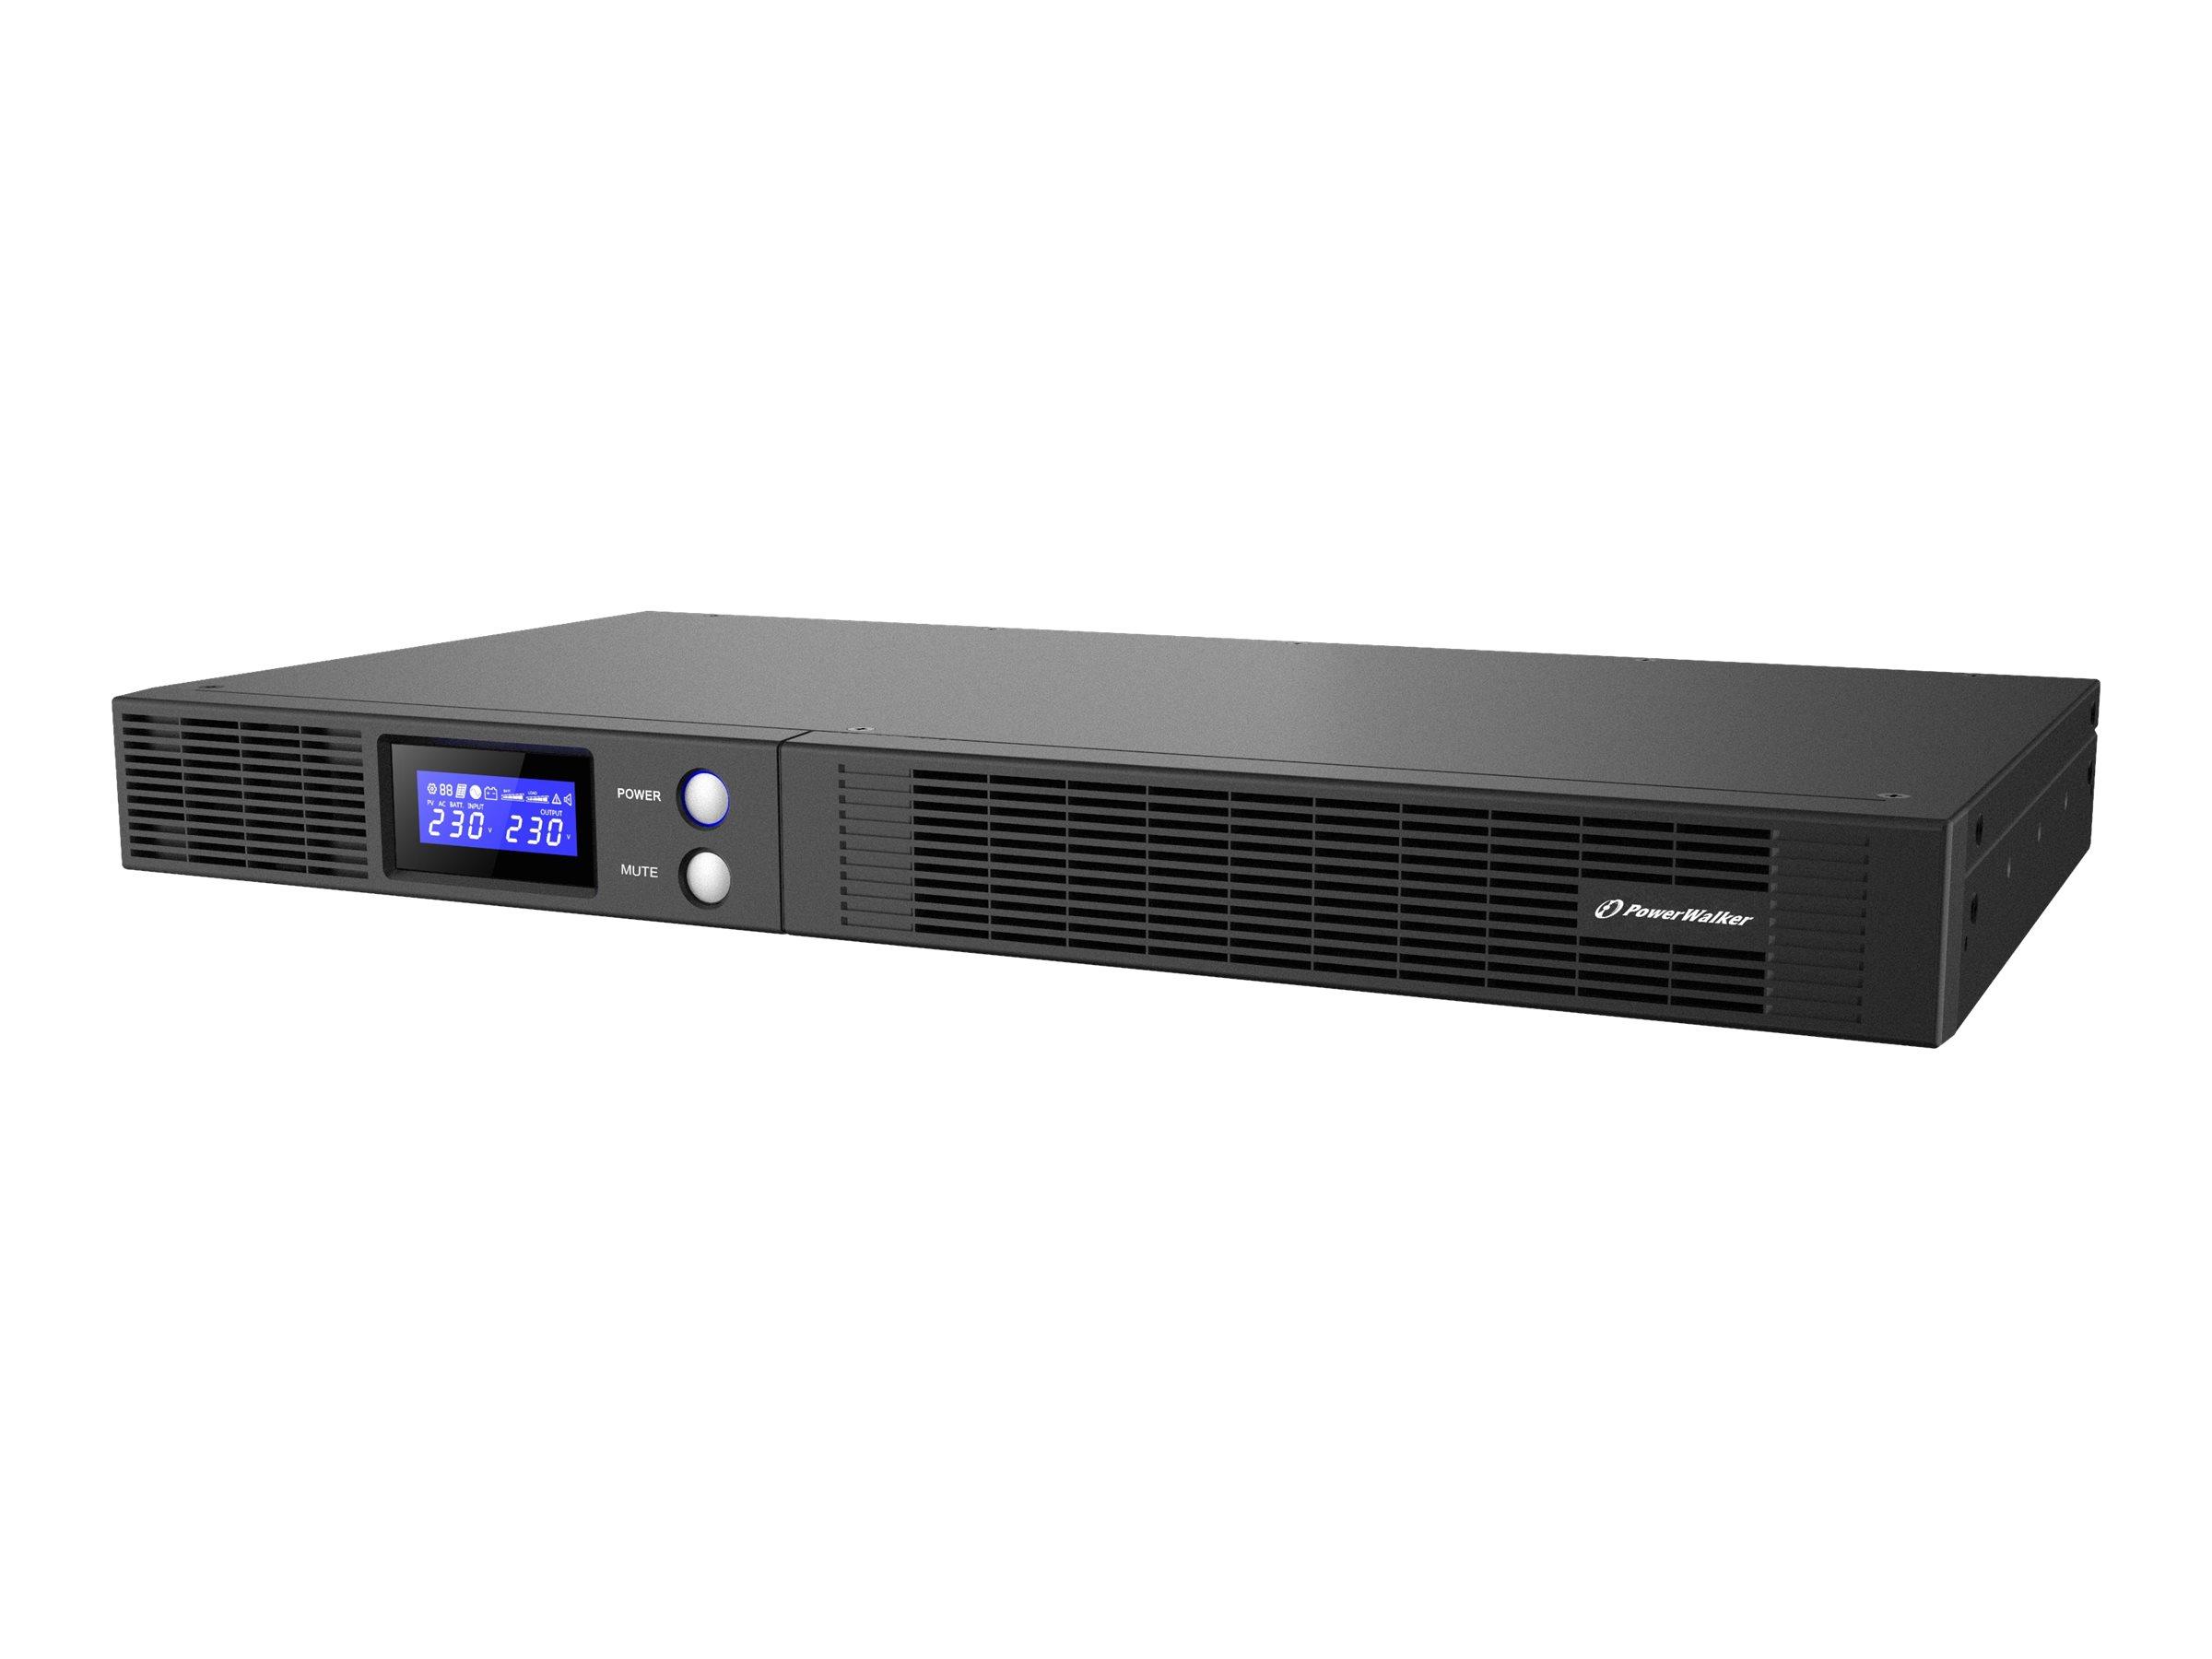 PowerWalker VI 1500 R1U - USV (Rack - einbaufähig) - Wechselstrom 230 V - 900 Watt - 1500 VA 9 Ah